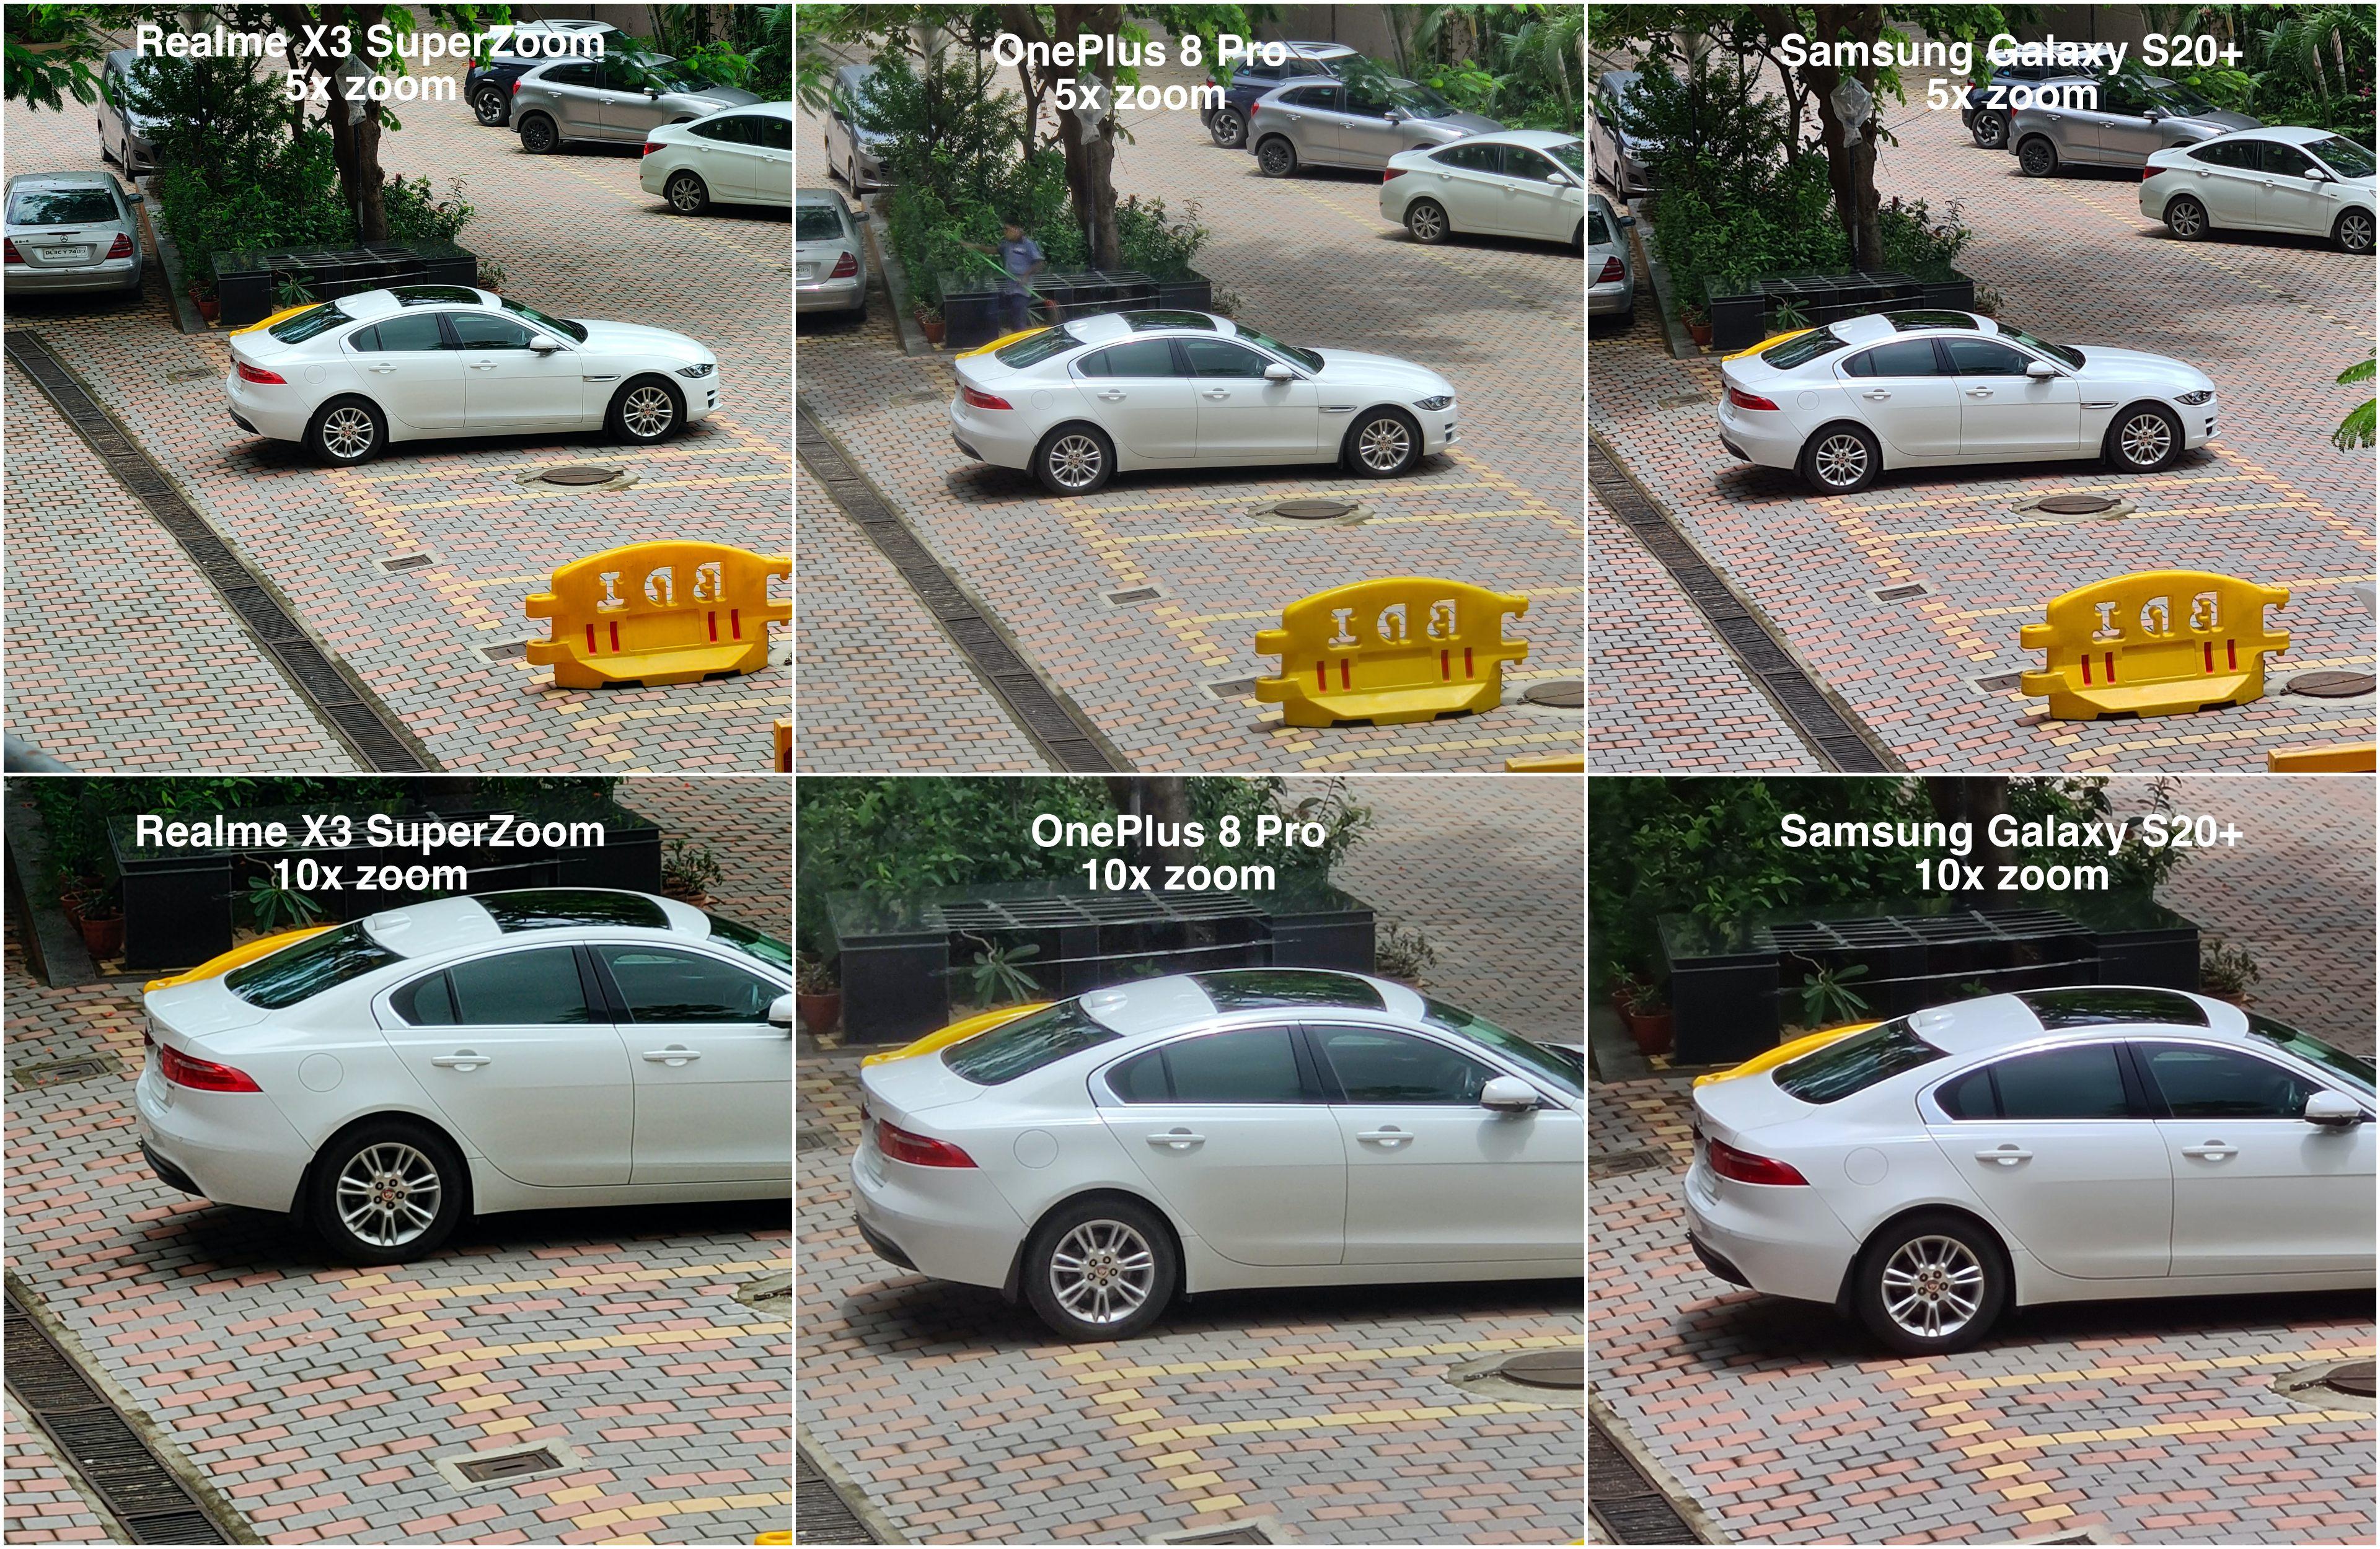 Realme X3 Superzoom Review Ndtv Gadgets 360 Delhitalkie